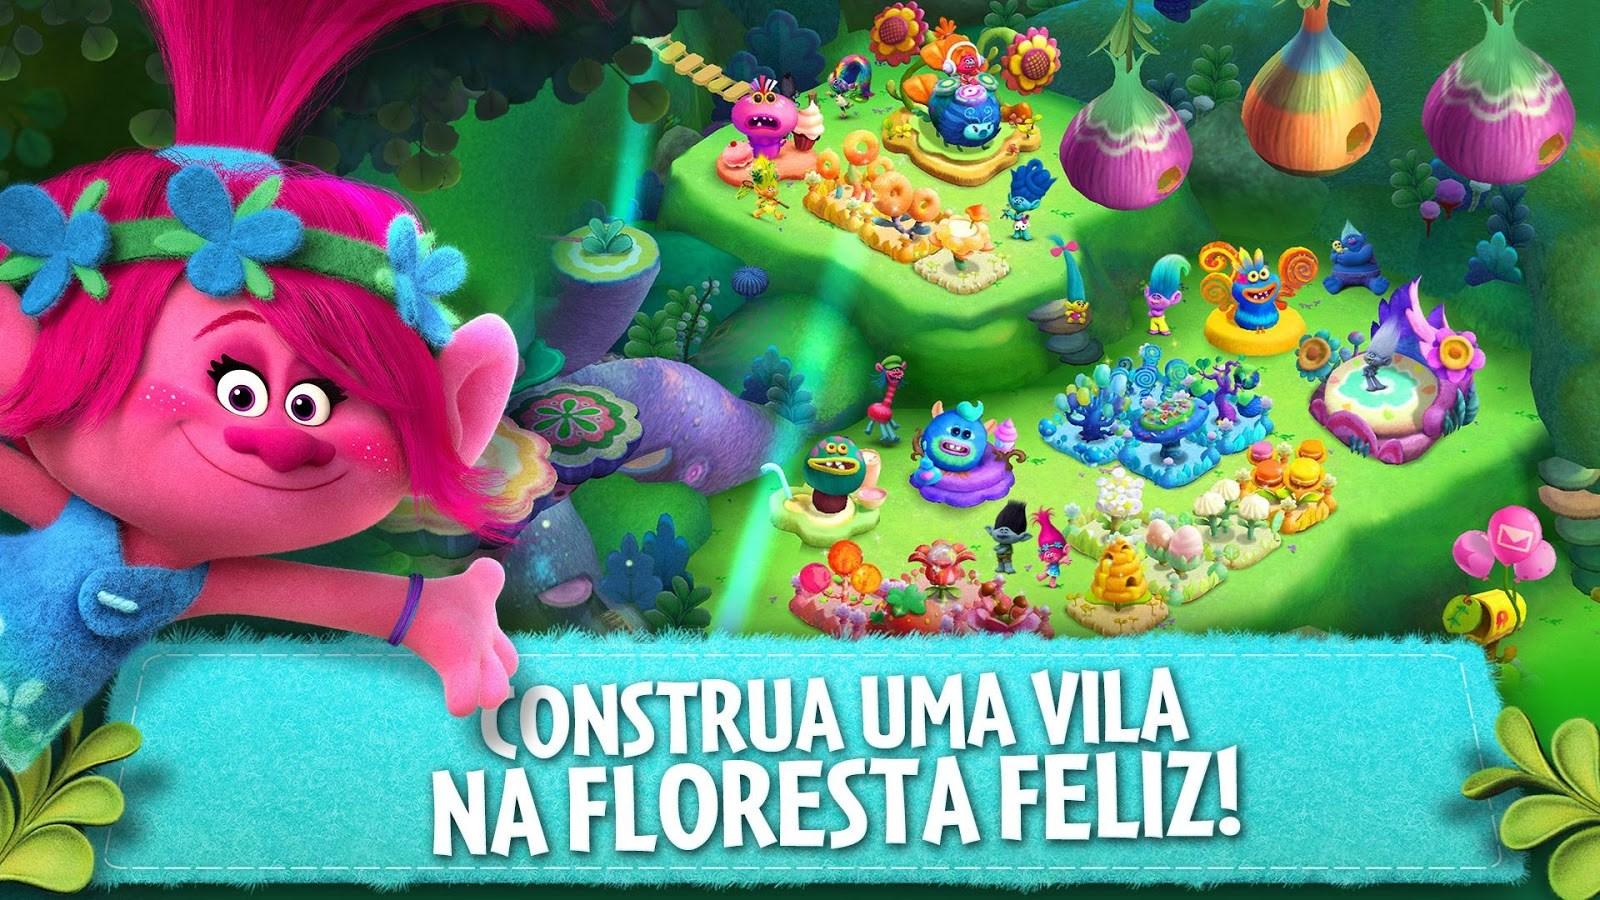 Trolls: Crazy Party Forest! - Imagem 1 do software